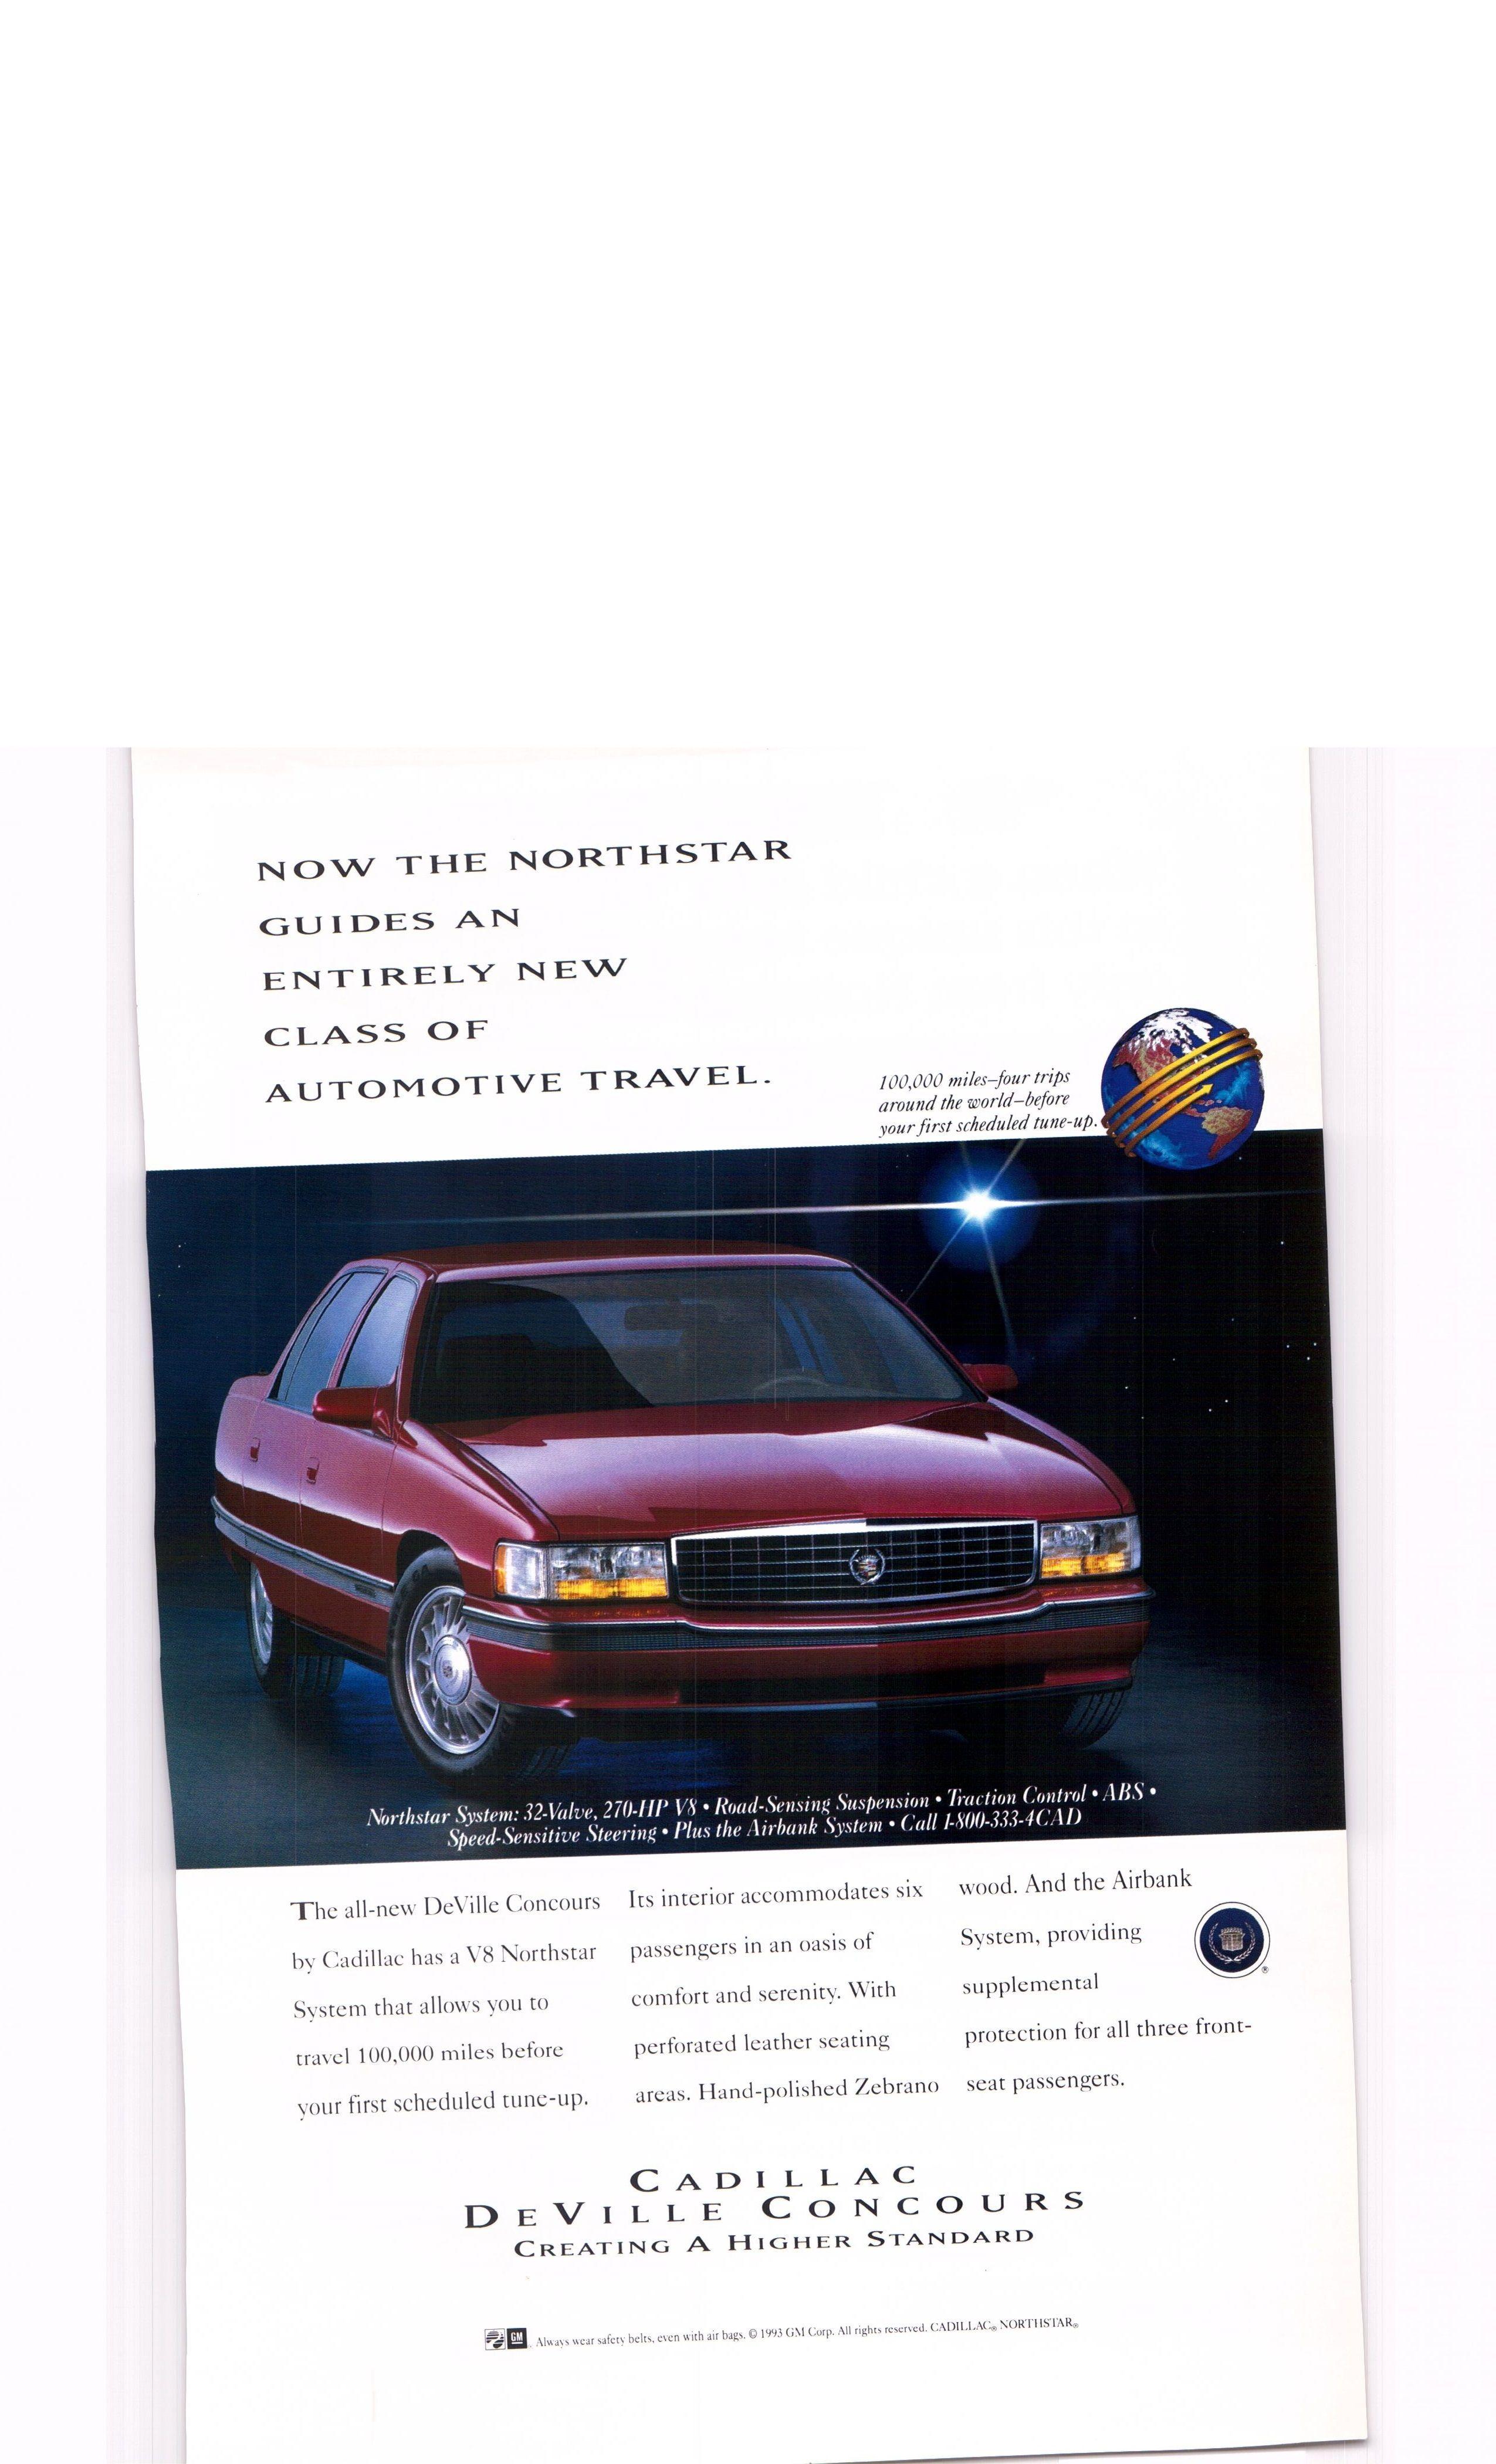 1994 cadillac deville concours national geographic august 1994 rh pinterest com Cadillac DeVille Wheels 2004 Cadillac DeVille Problems